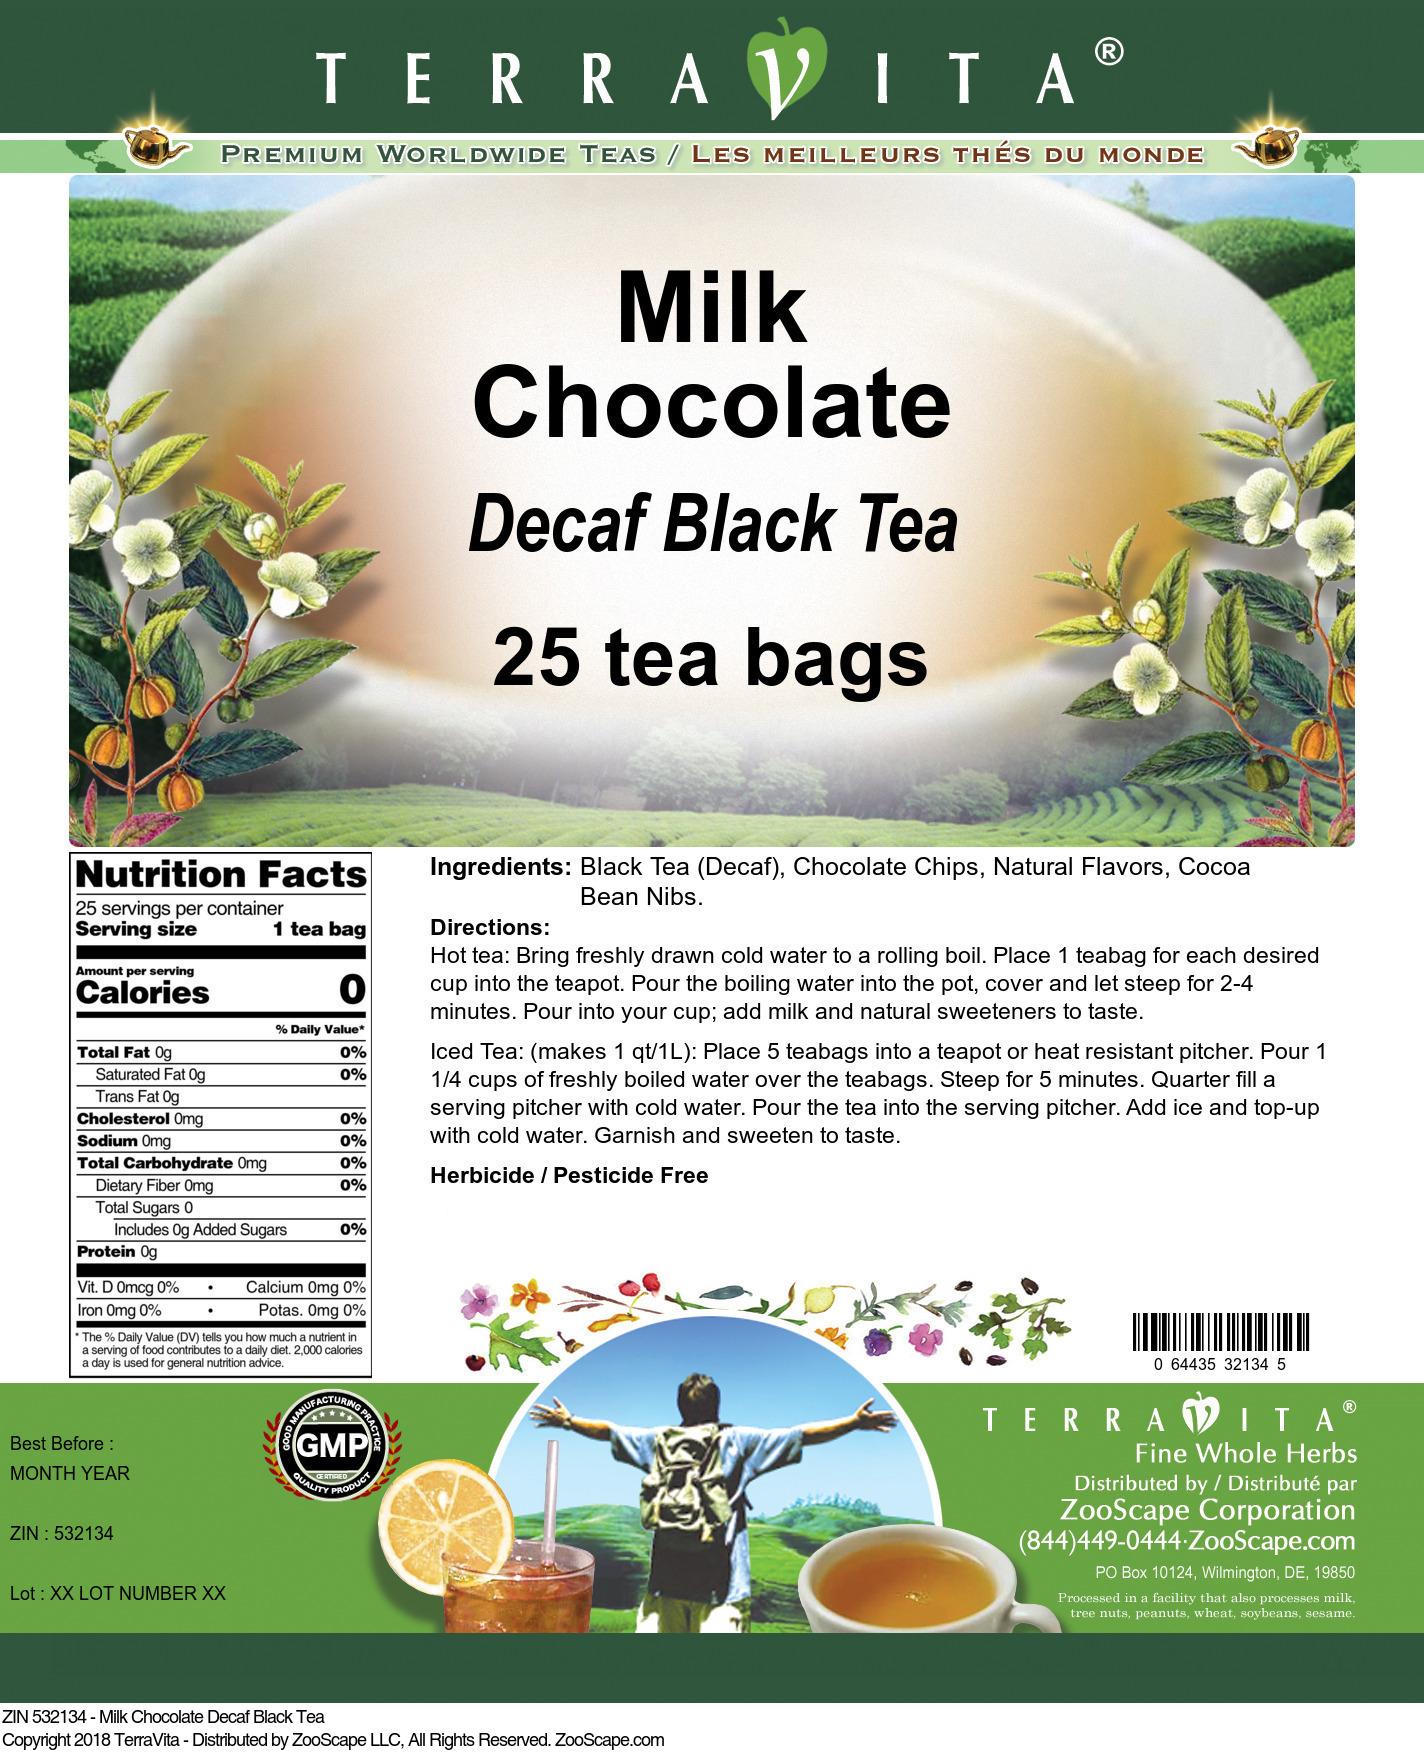 Milk Chocolate Decaf Black Tea